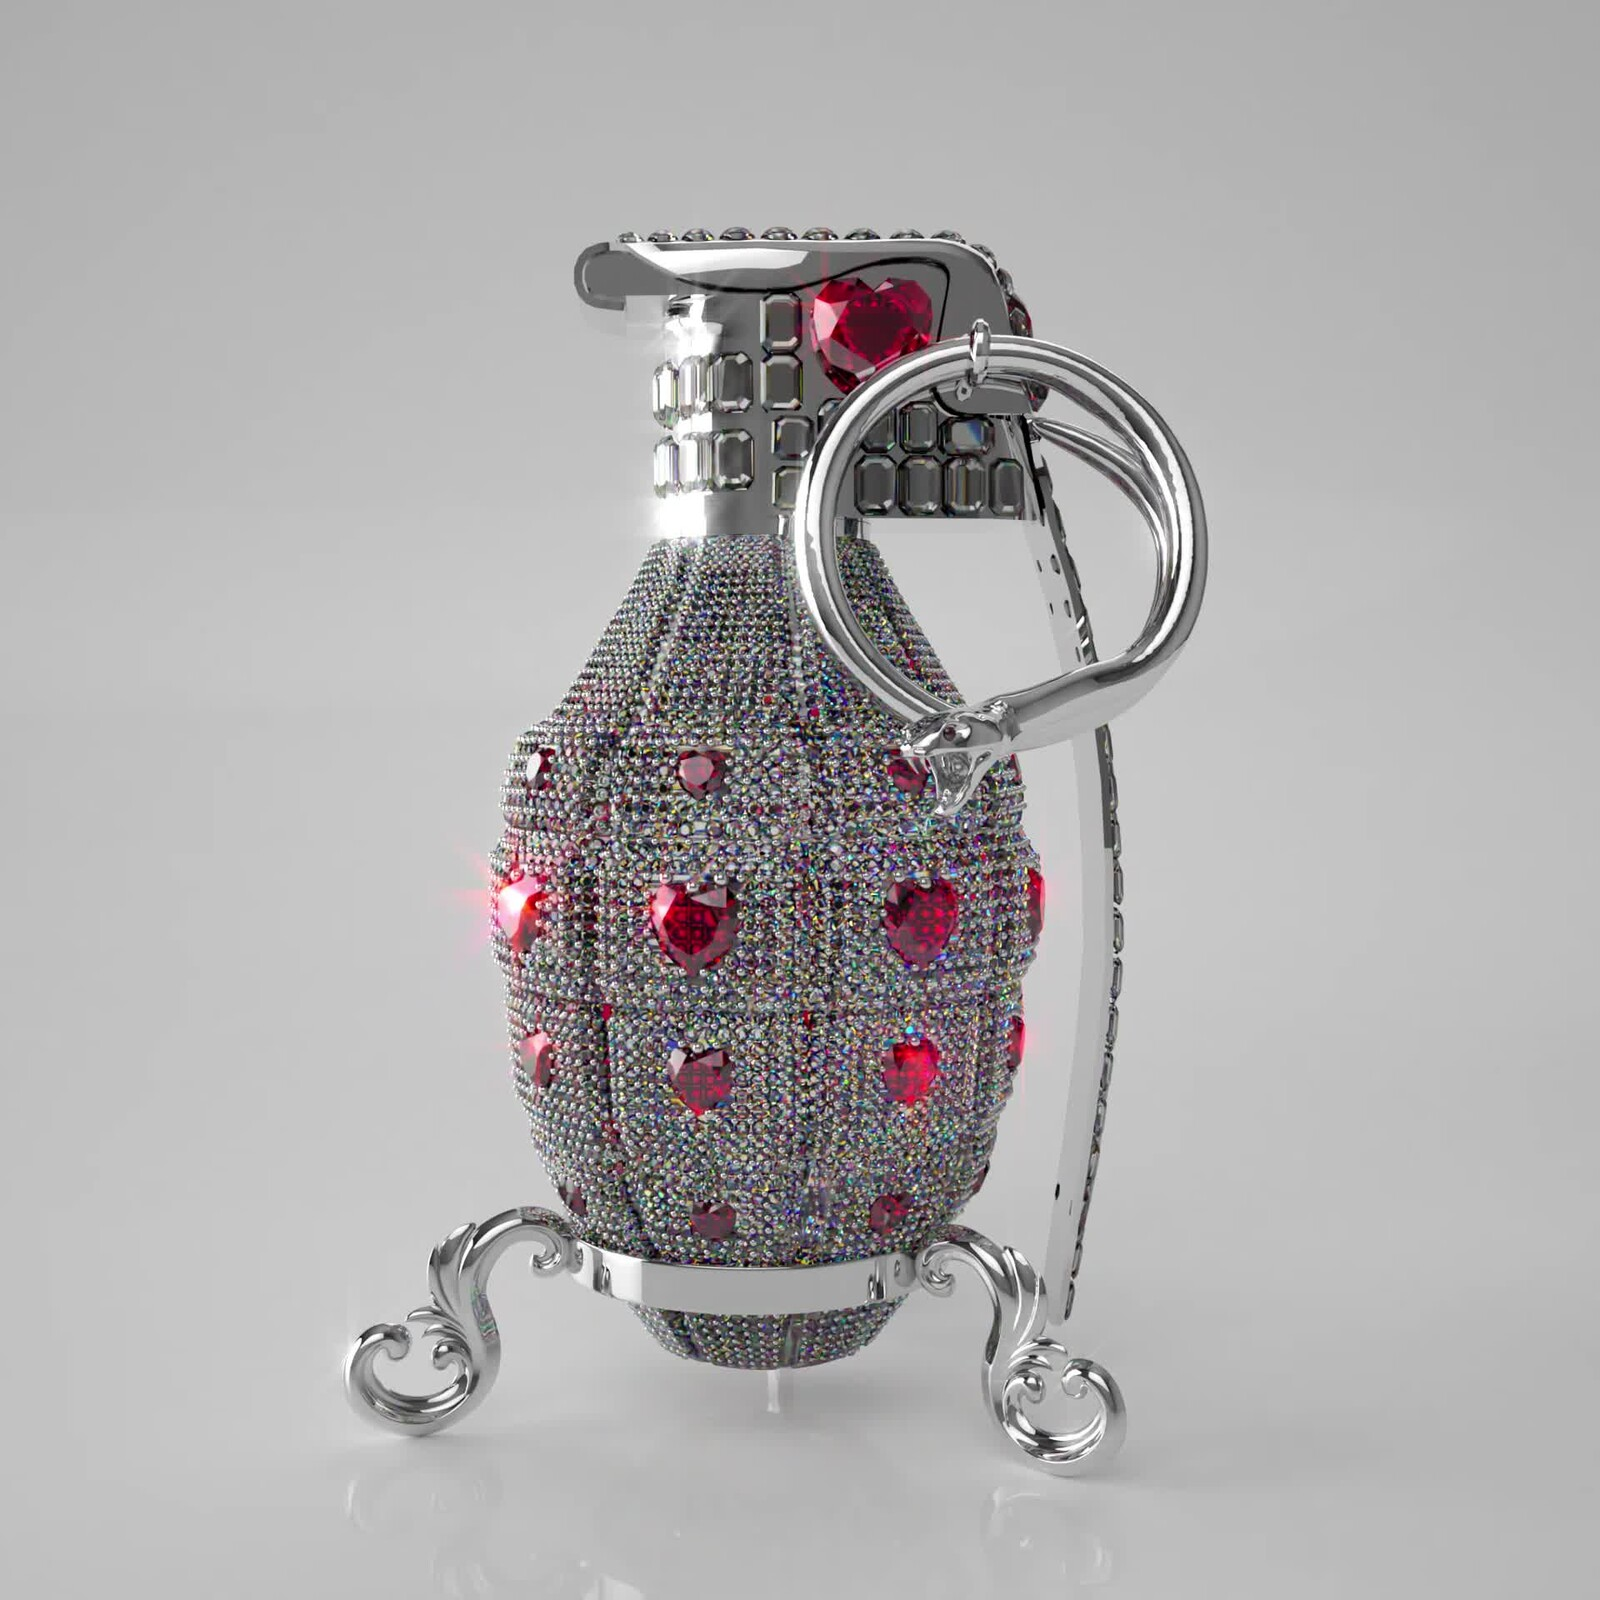 Pyrobolus Convenusto - Bejeweled